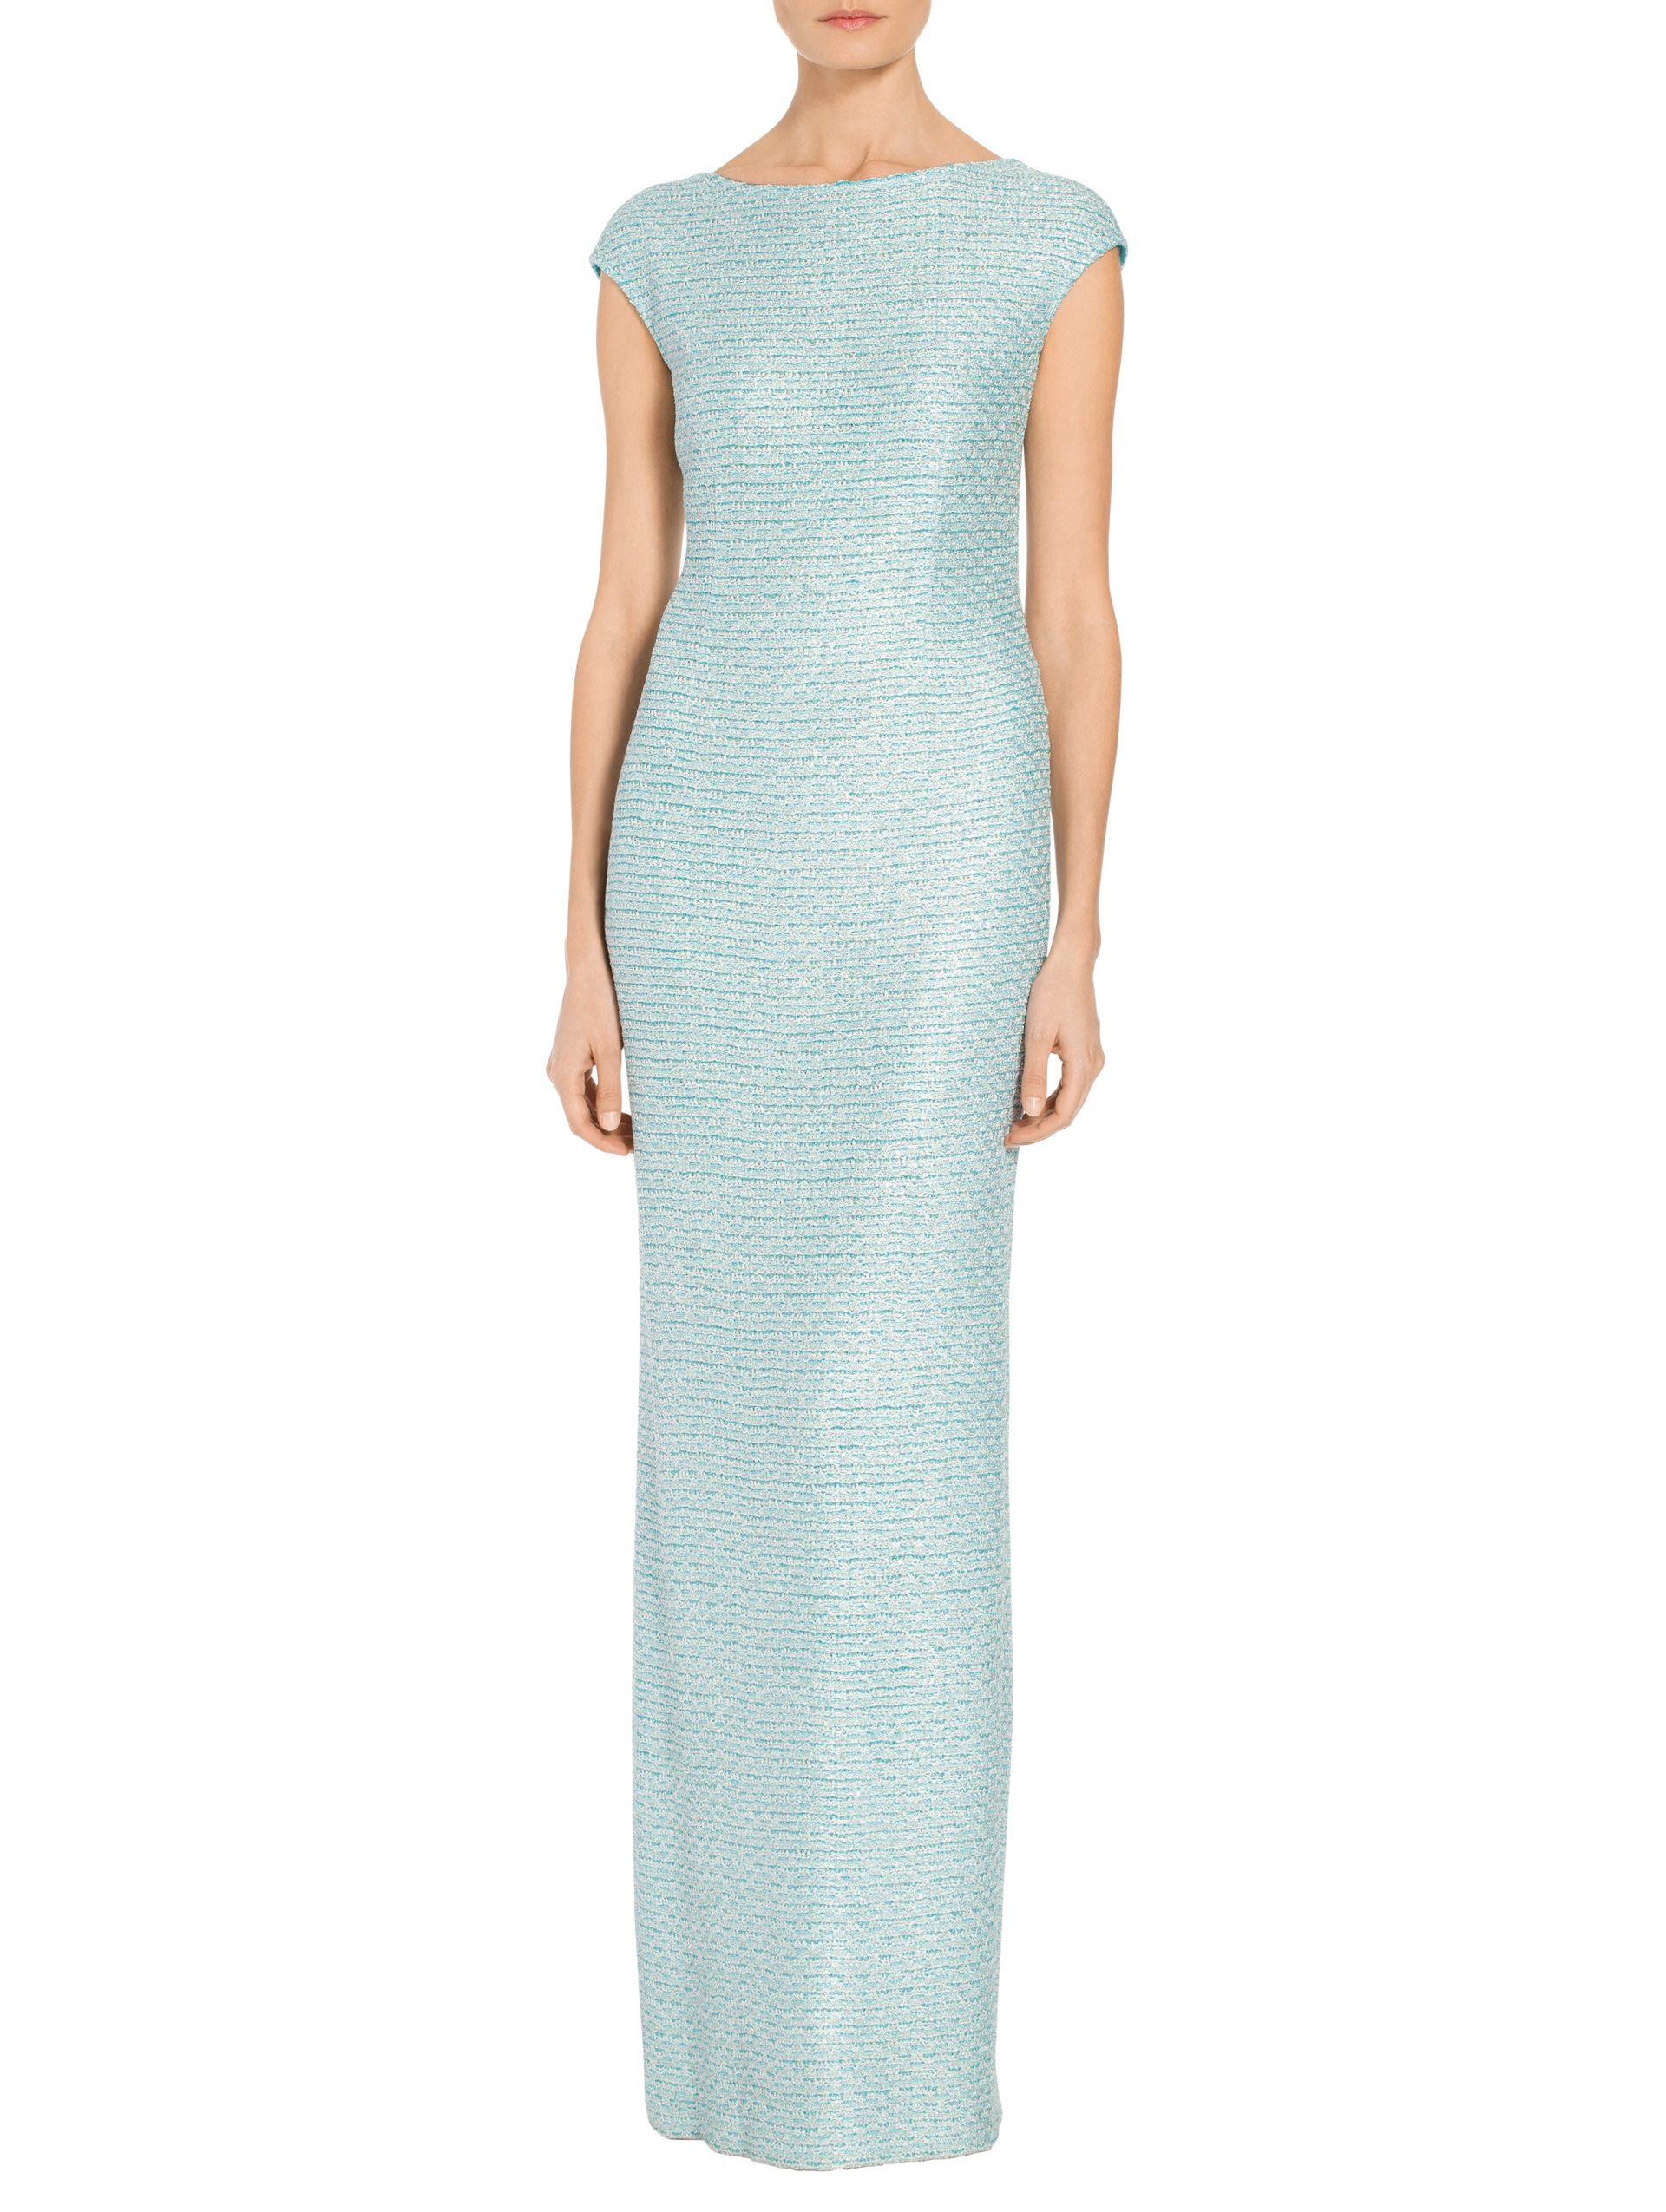 Women\'s Glitter Sequin Knit Cap Sleeve Gown | St. John Knits